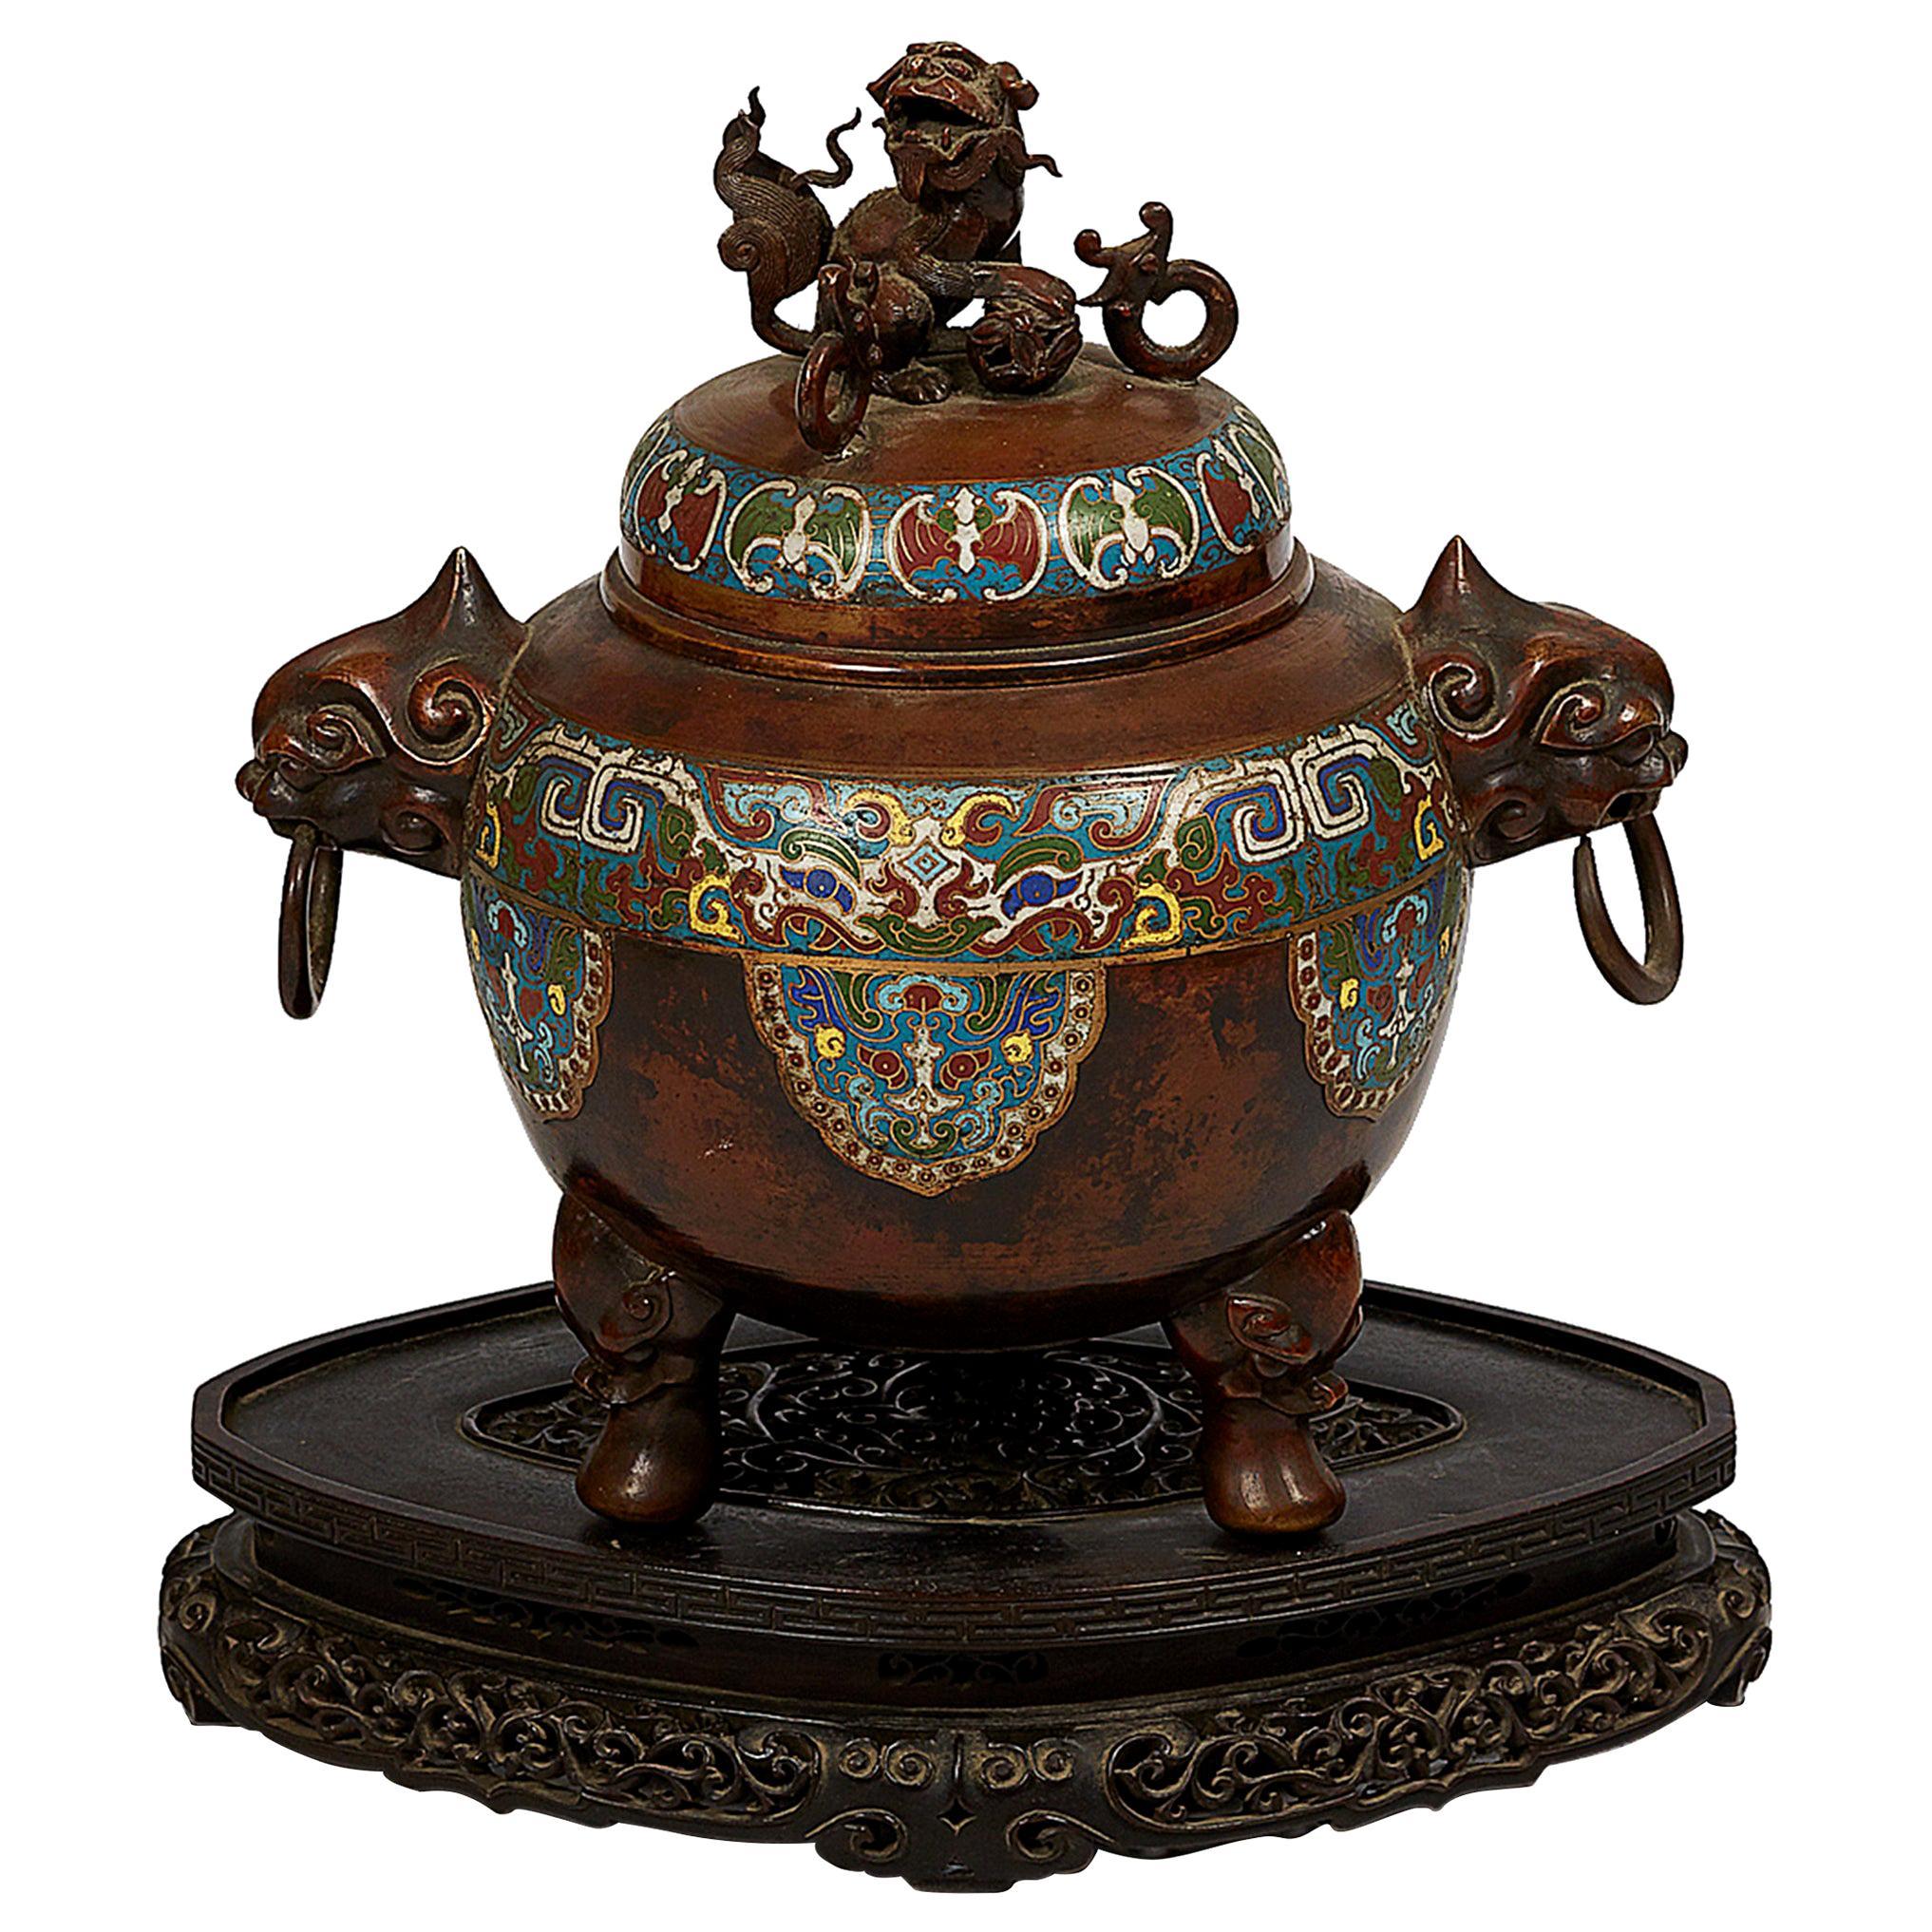 Japanese Meiji Period Bronze and Champlevé Enameled Censer